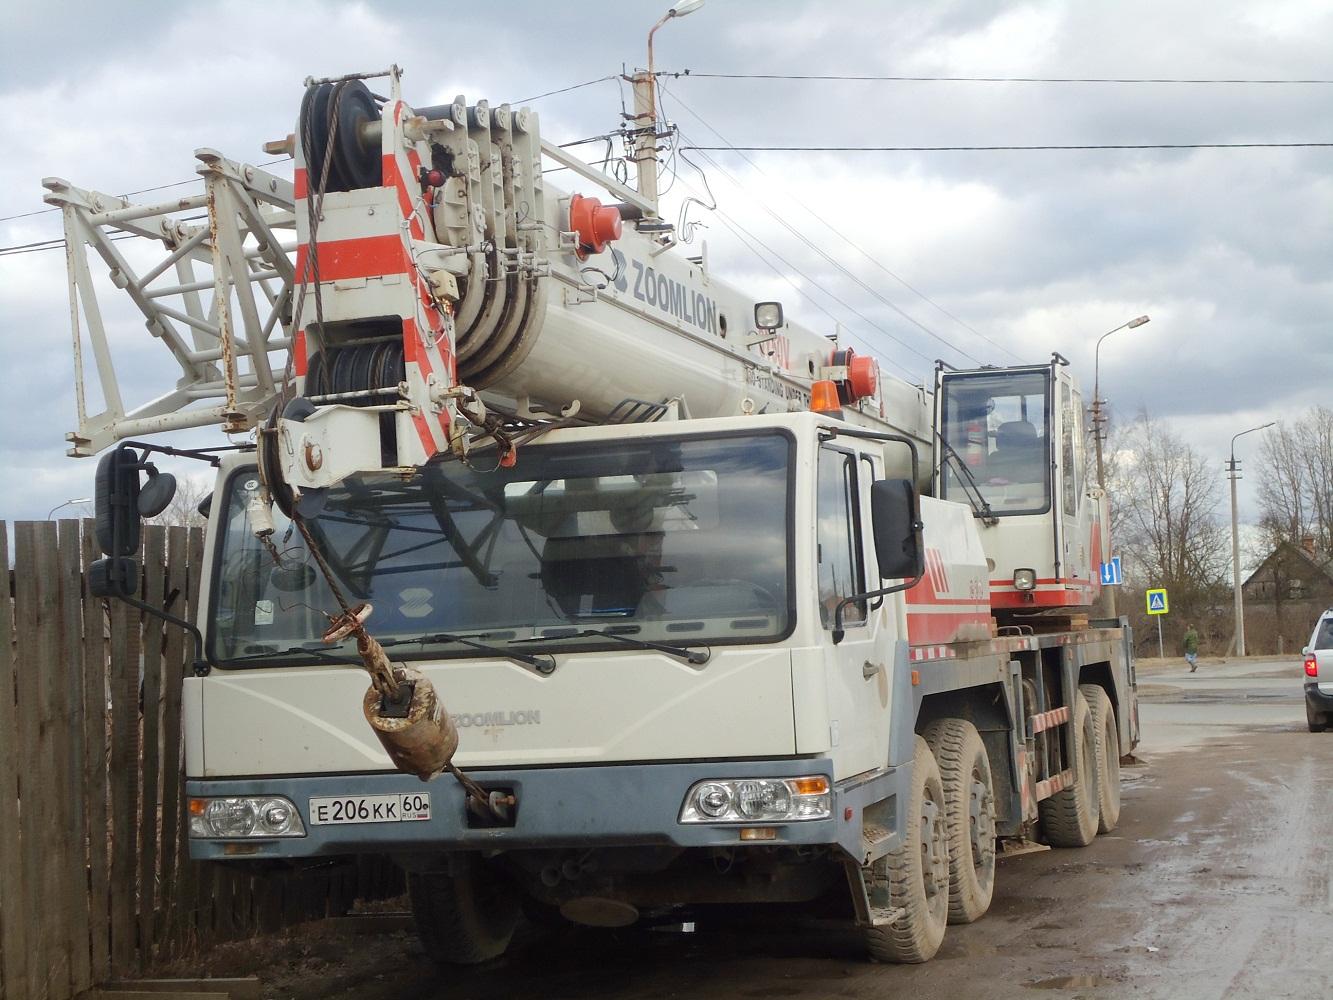 Автокран Zoomlion ZLJ5419JQZ50V #Е 206 КК 60. Псков, улица Белинского